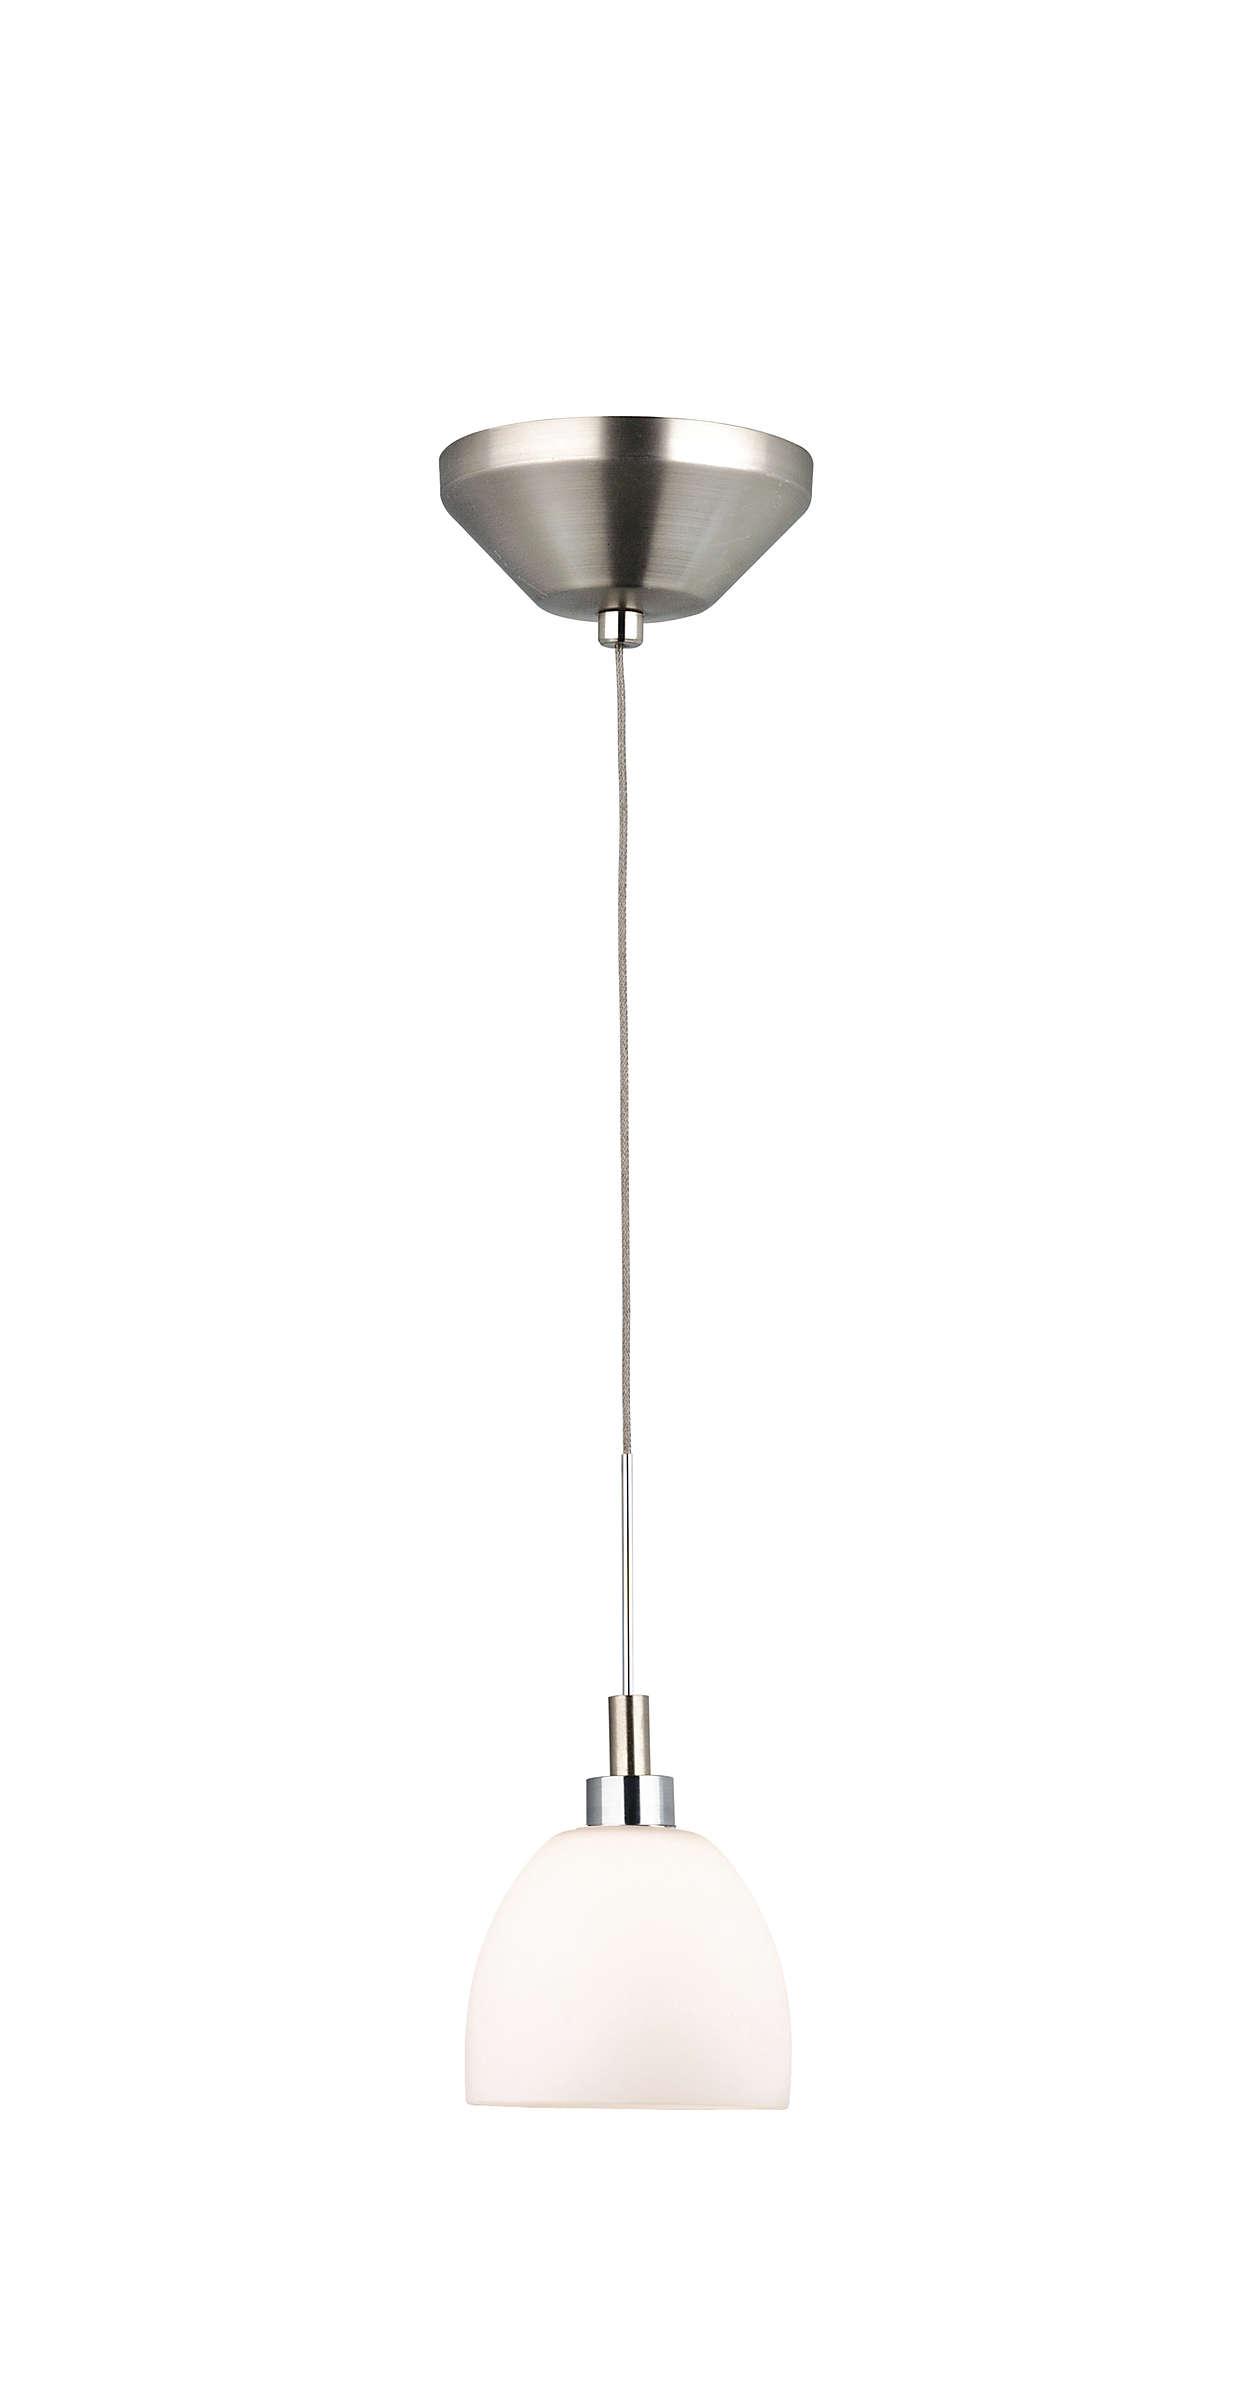 Bolla 1-light pendant in Satin Nickel finish